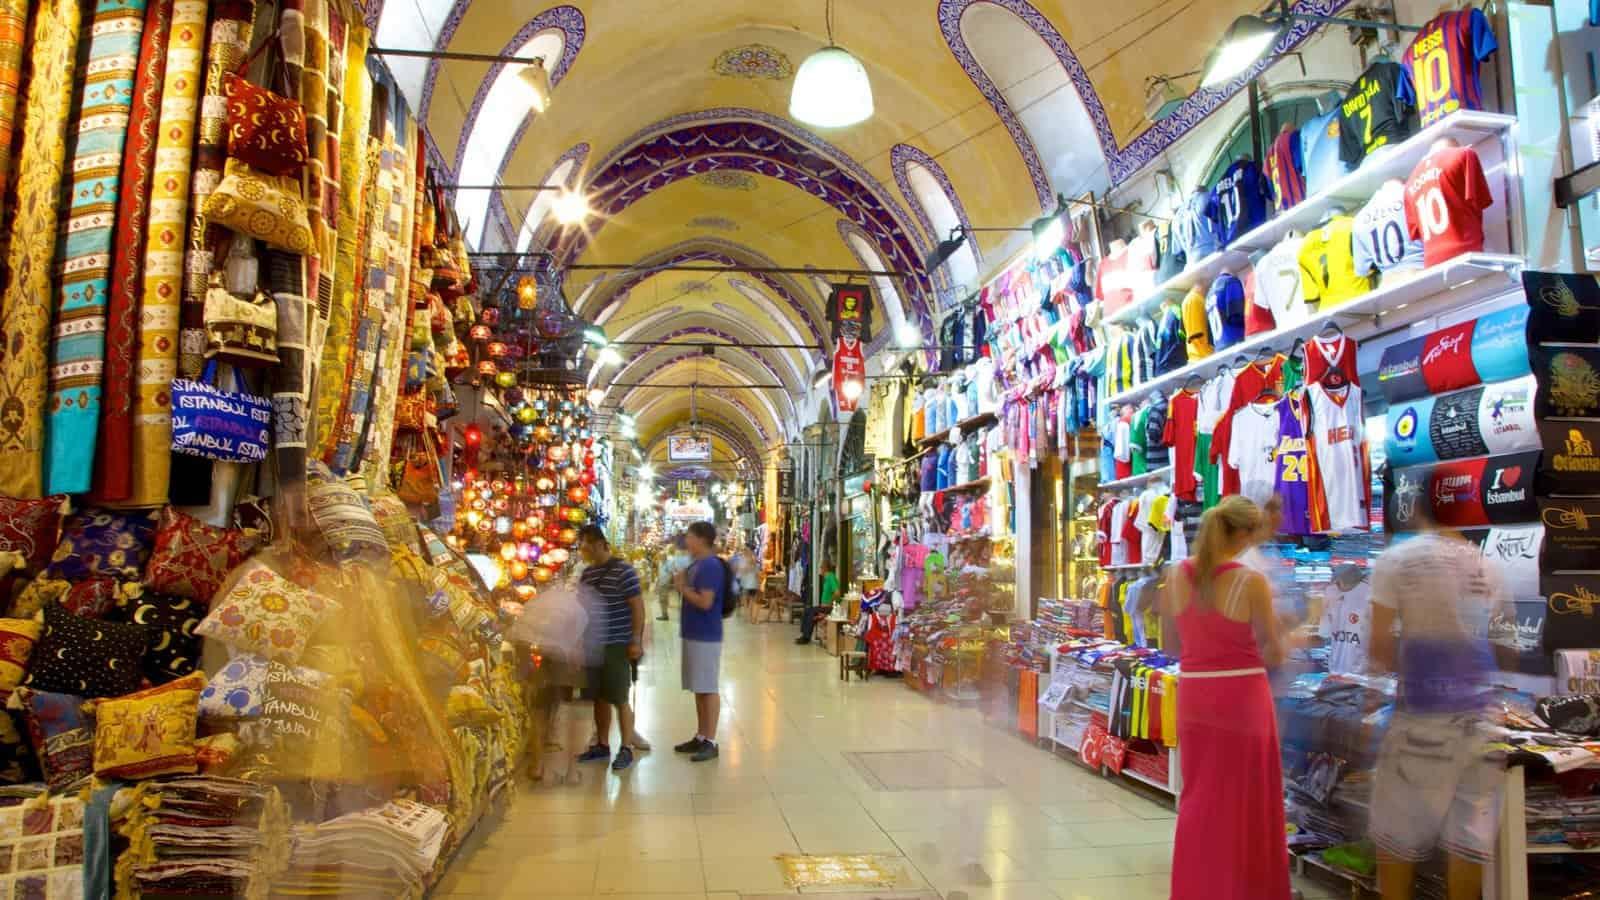 f21745ffe6c12 أشهر أماكن التسوق في اسطنبول وارخصها - موسوعة